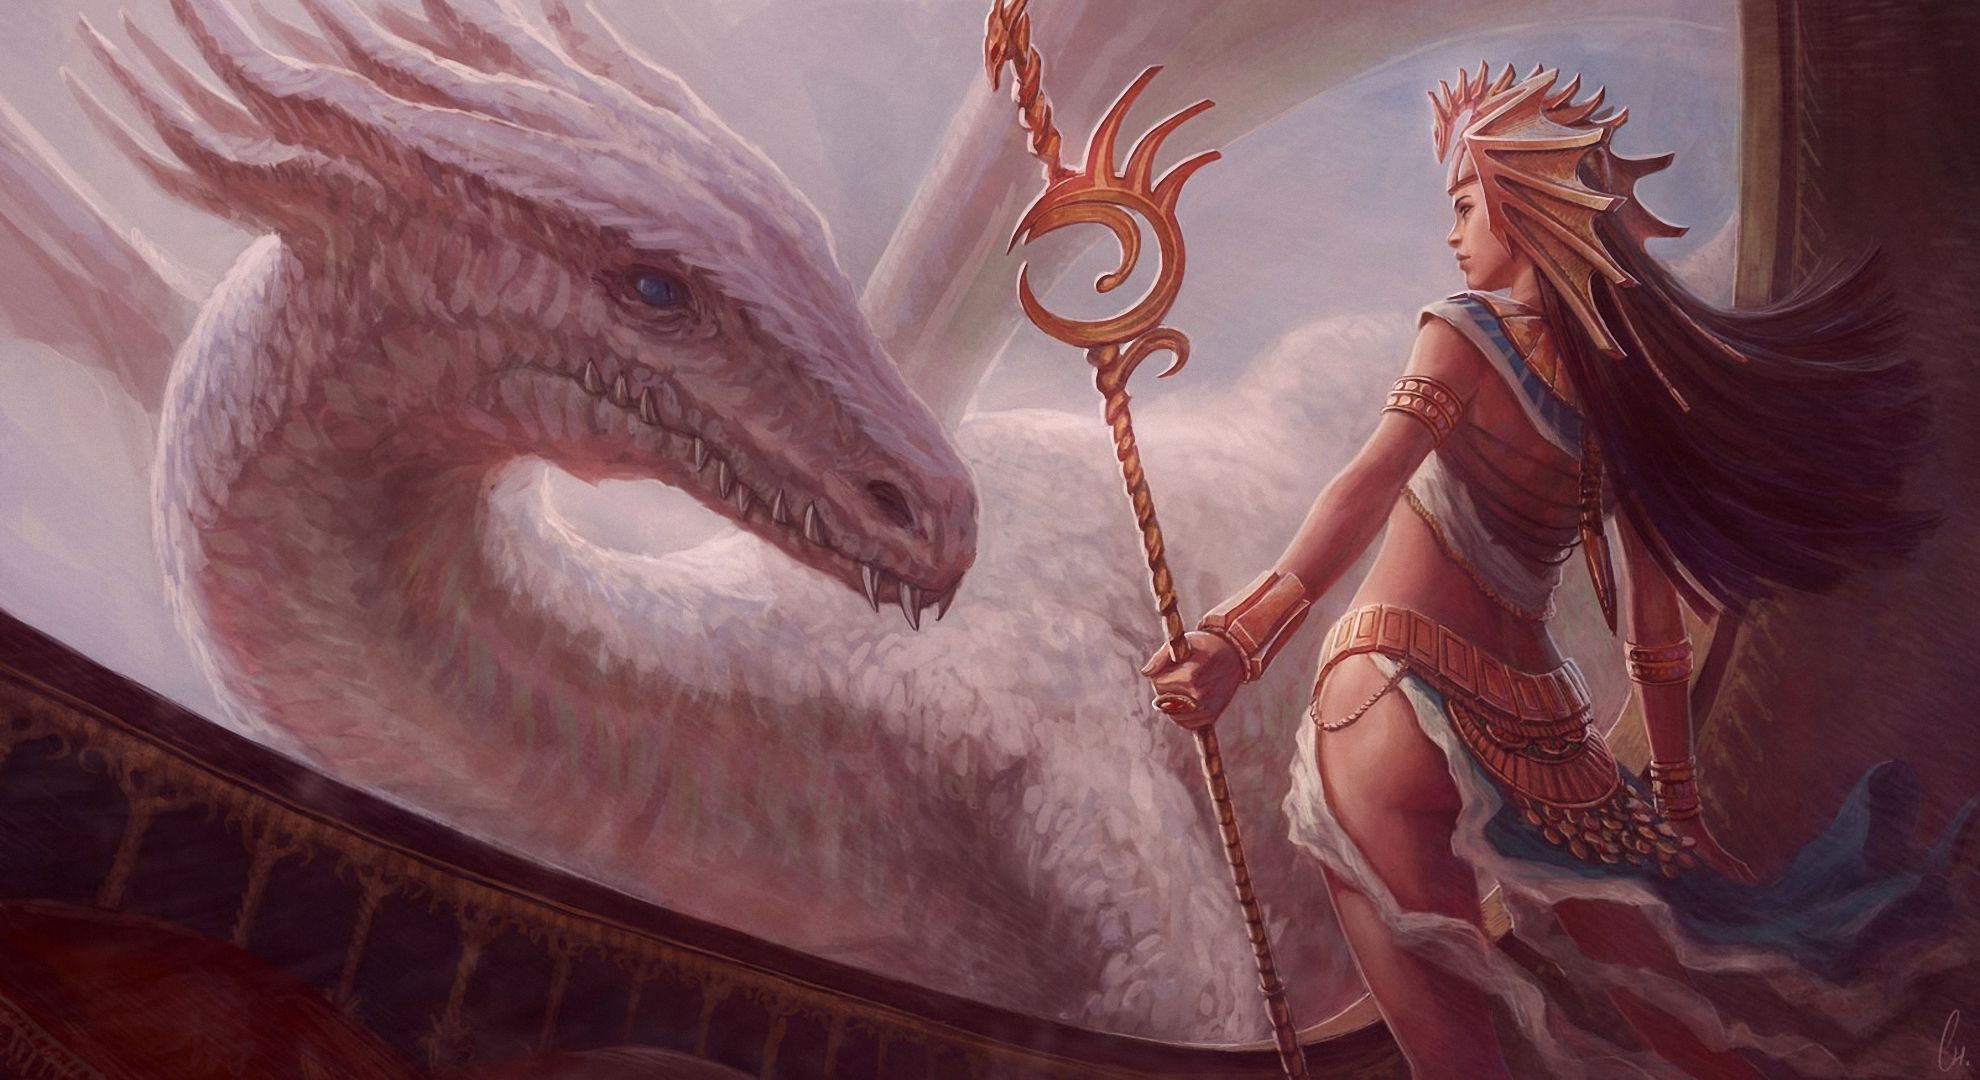 Dragon Mage Staff Fantasy Girls Wallpaper 1980x1080 166419